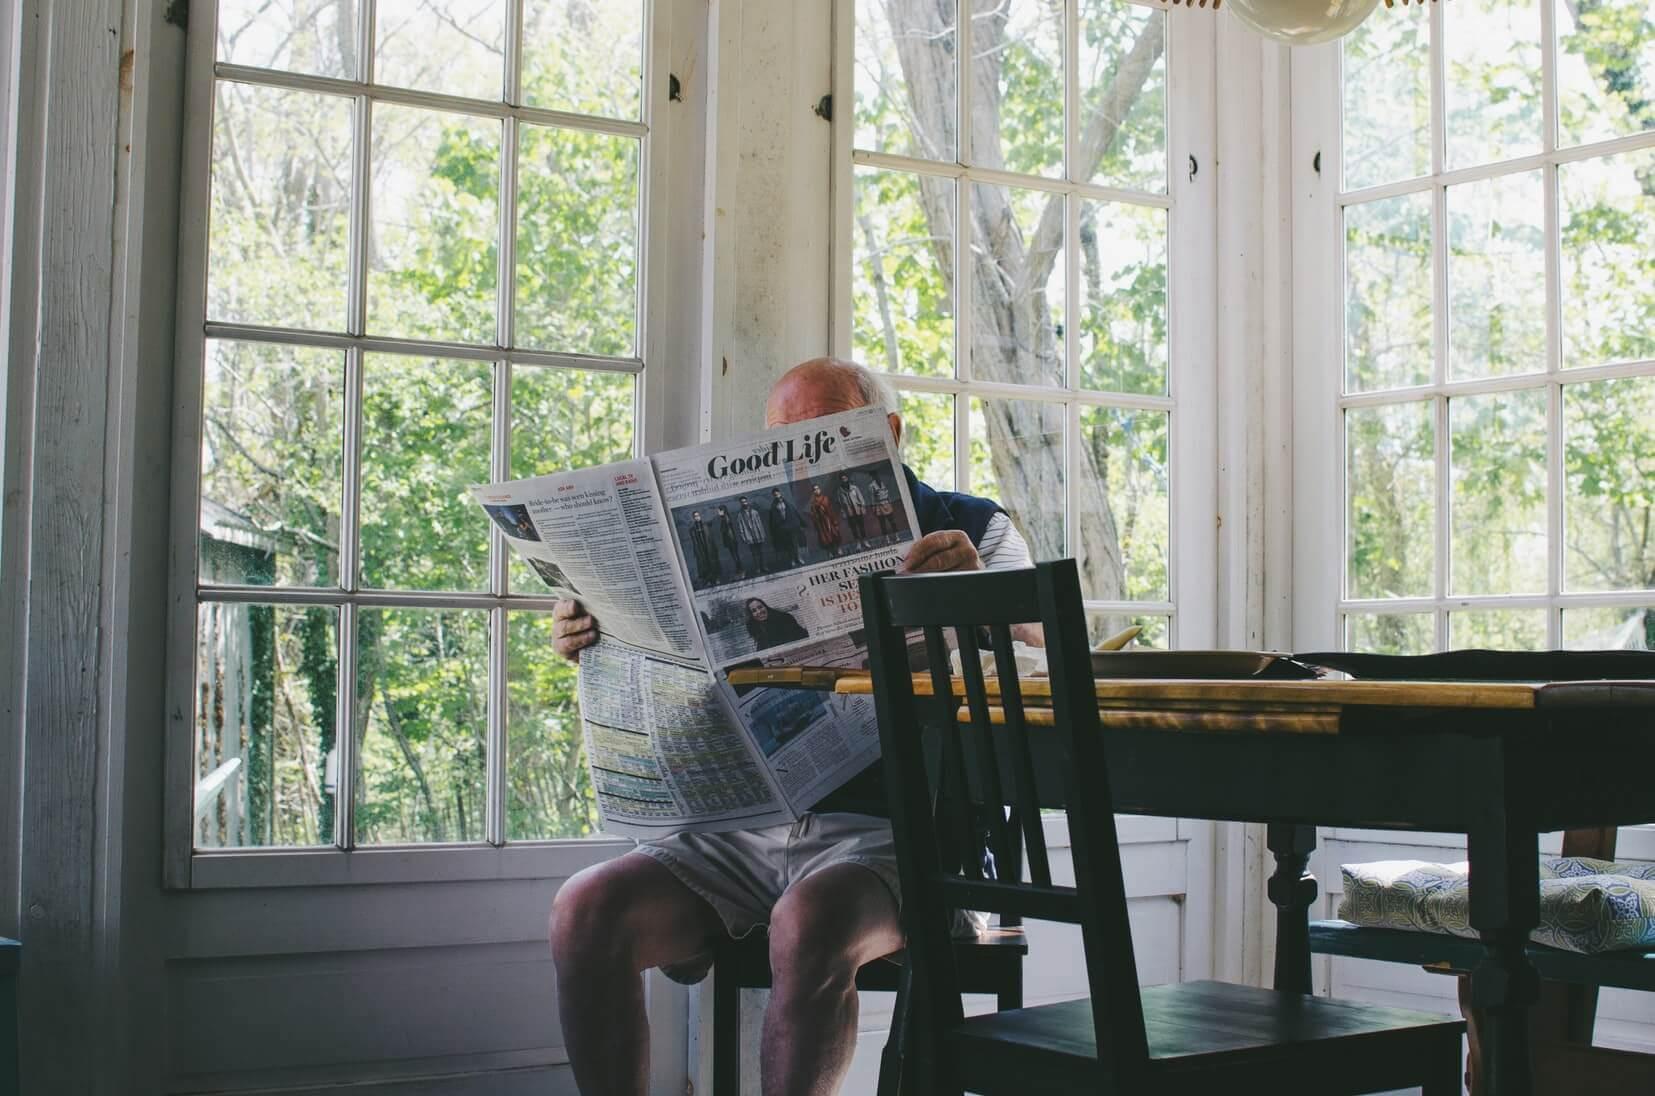 Поясним за новости: кое-кто в 101 год излечился от коронавируса